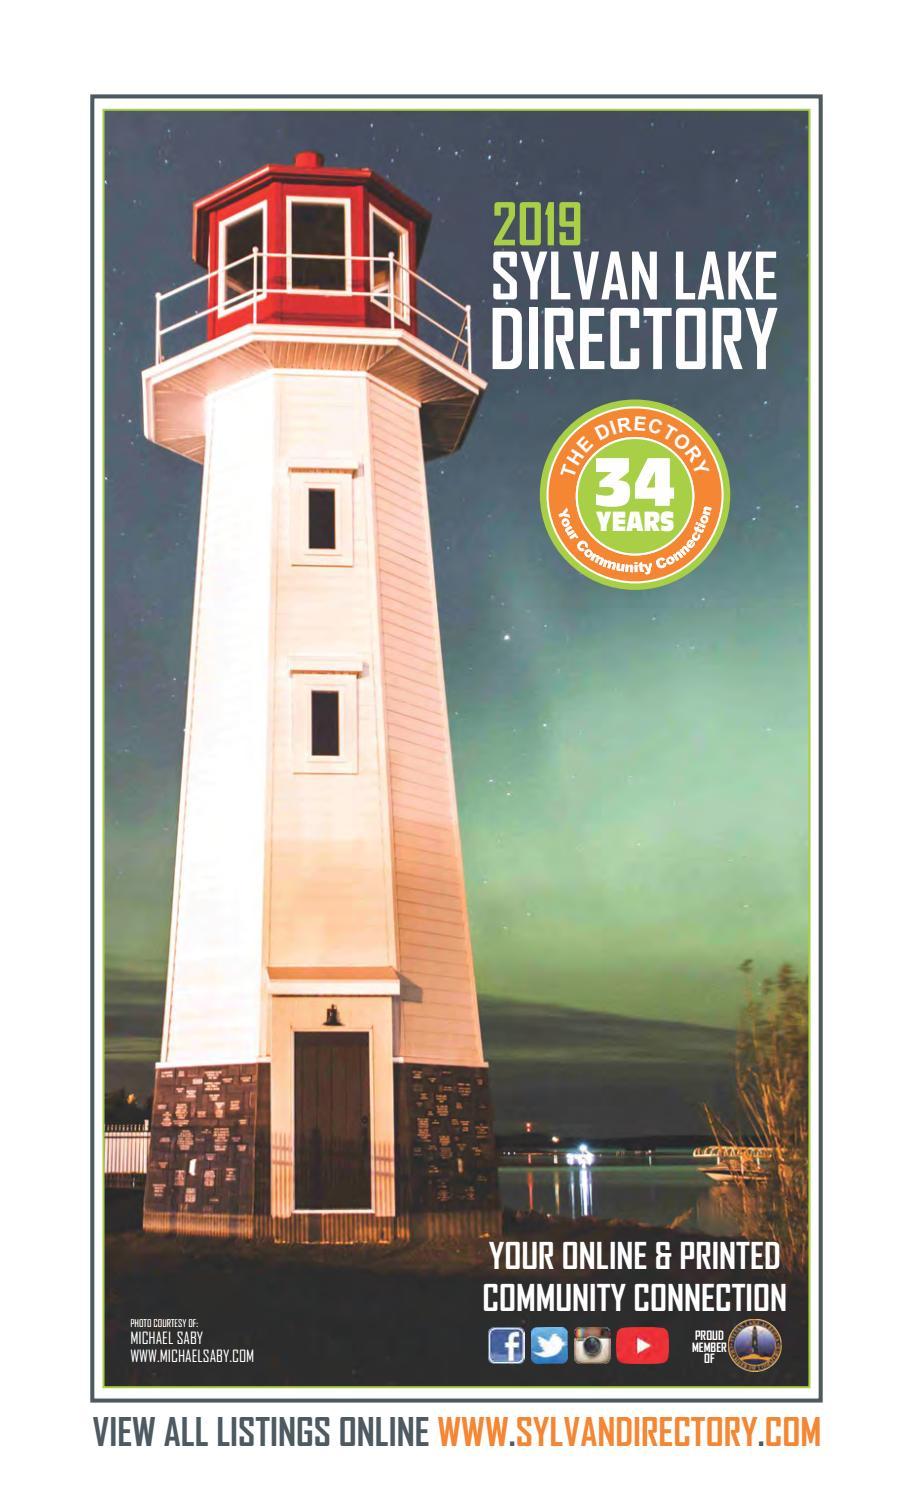 2019 Sylvan Lake Directory by Sylvan Lake Directory - issuu